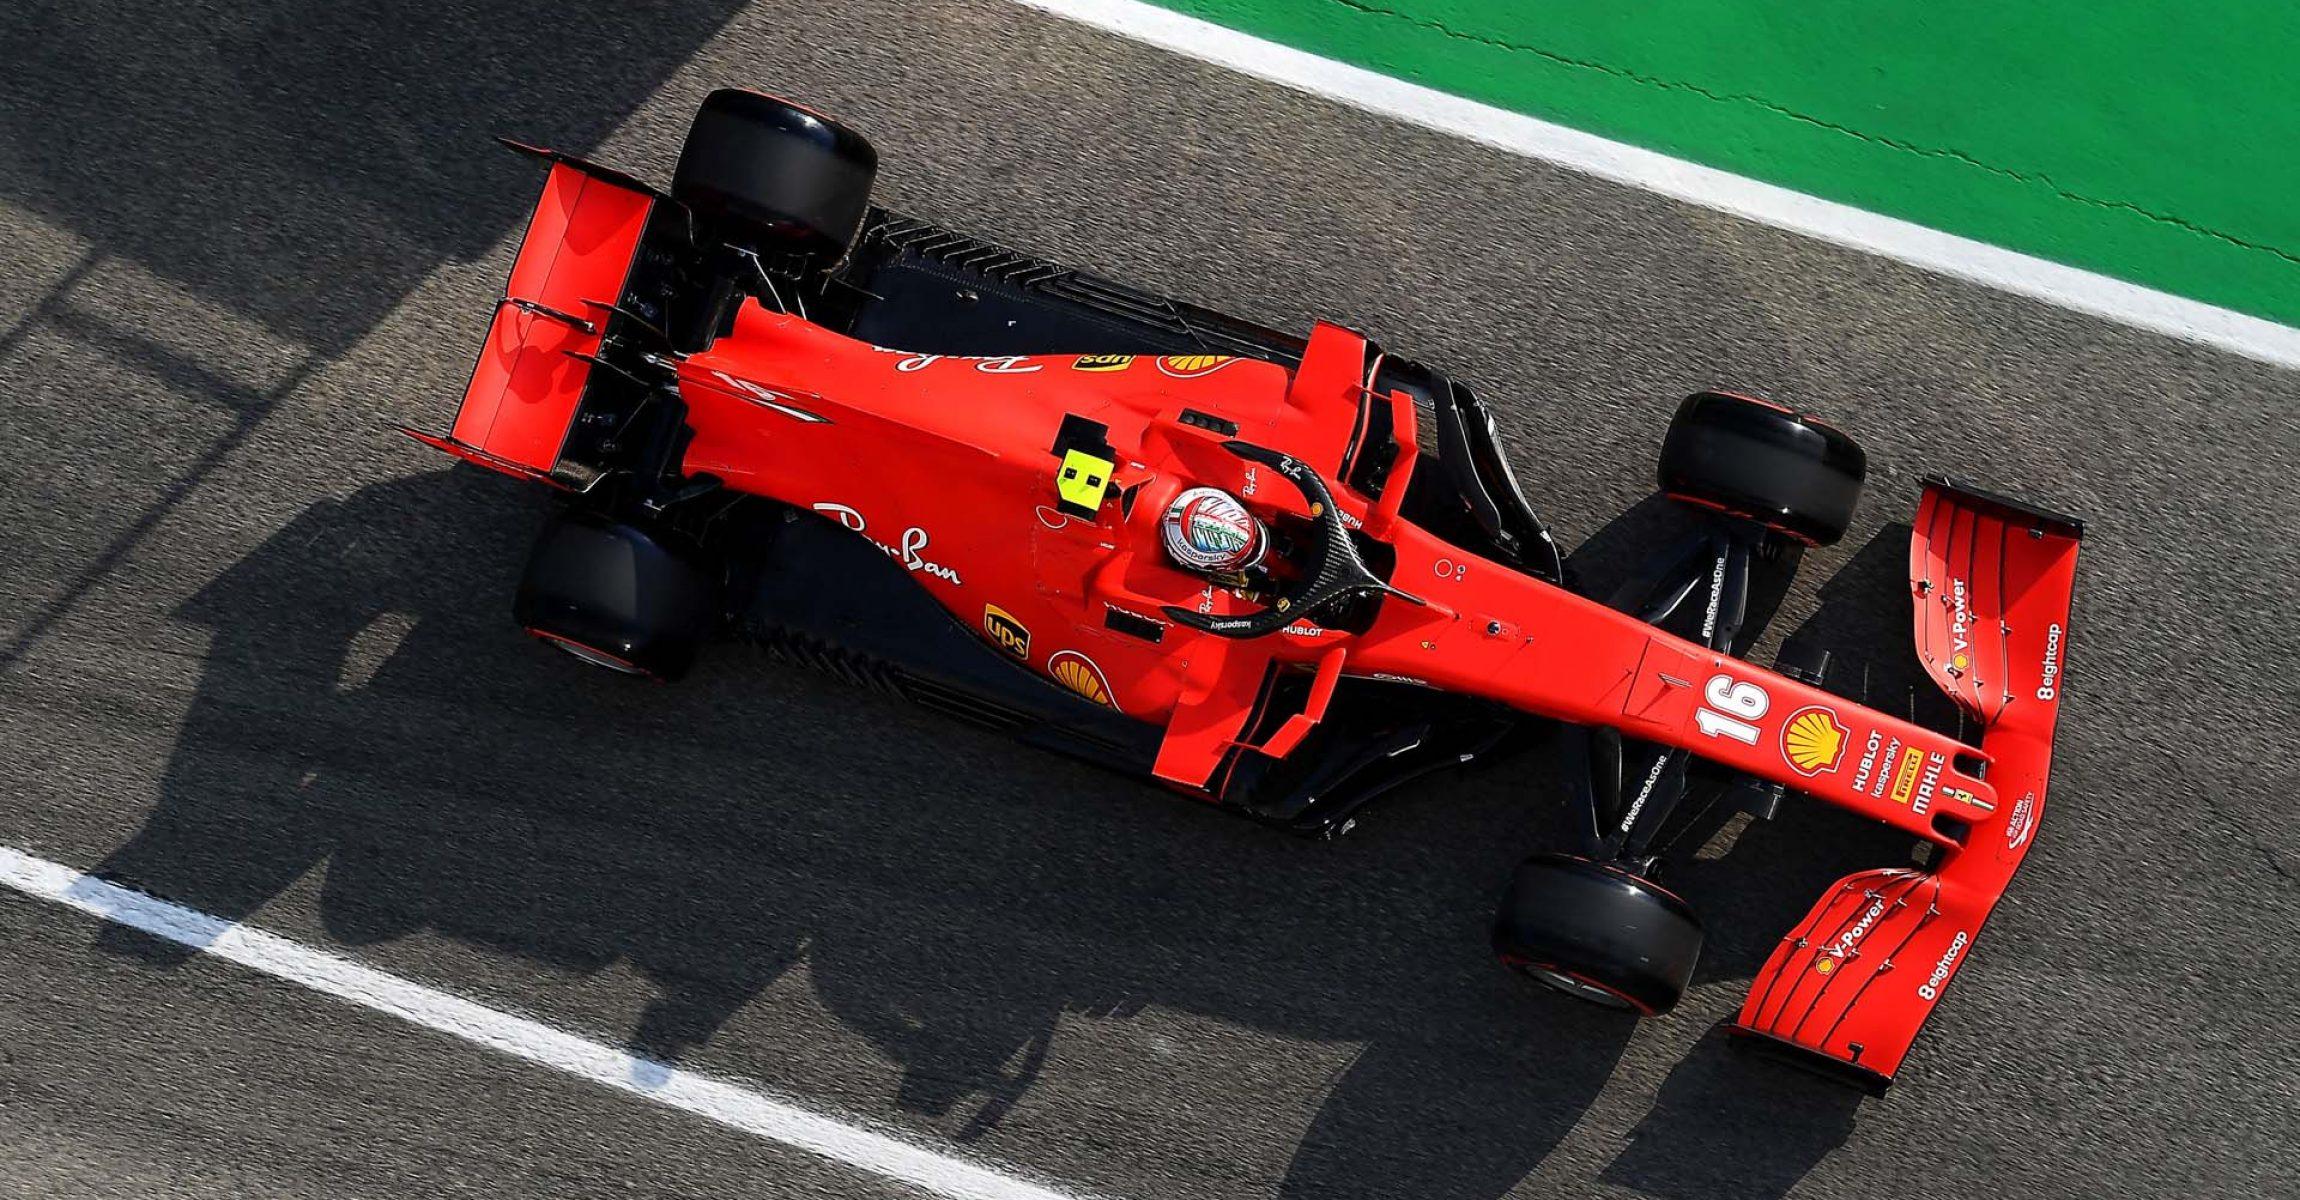 GP EMILIA ROMAGNA F1/2020 -  SABATO 31/10/2020    credit: @Scuderia Ferrari Press Office Charles Leclerc